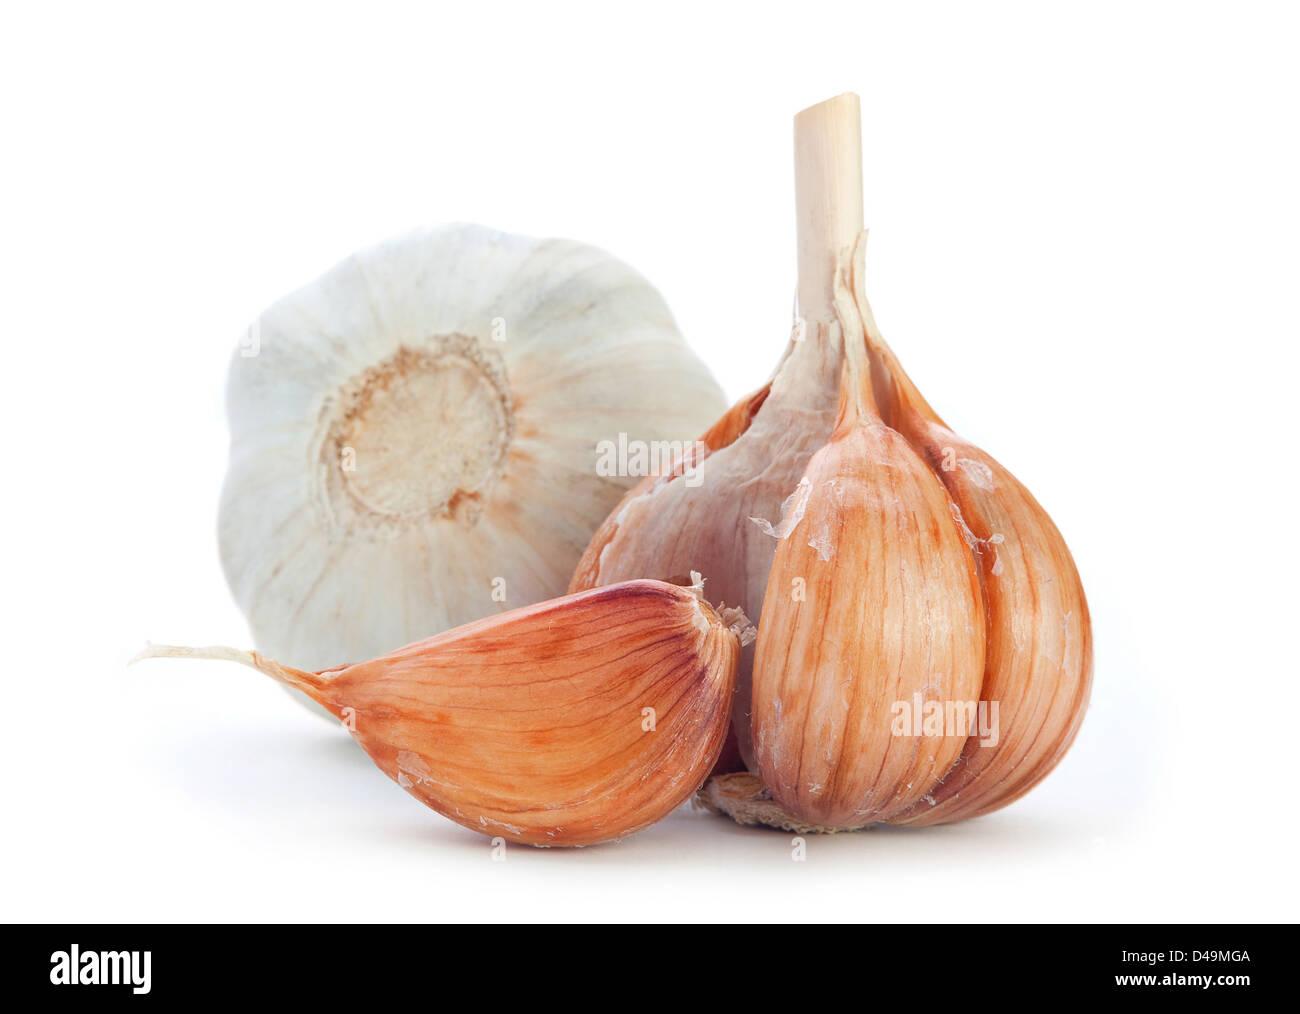 Garlic vegetable on white background - Stock Image